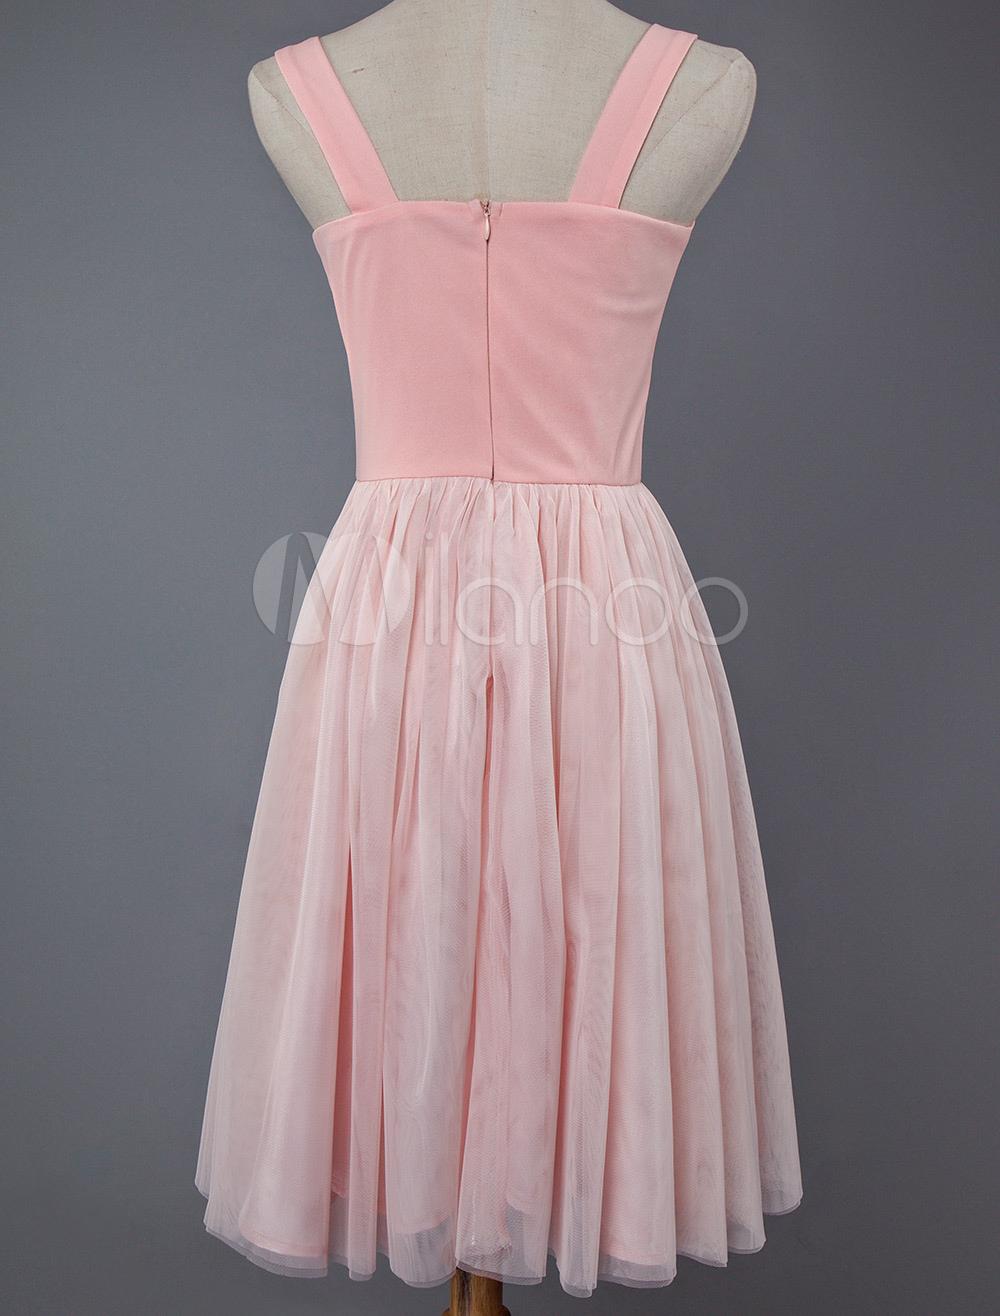 debbd7d45b ... Pink Skater Dress Short Prom Dress Tulle Straps Women Flared Homecoming  Dress-No.6 ...